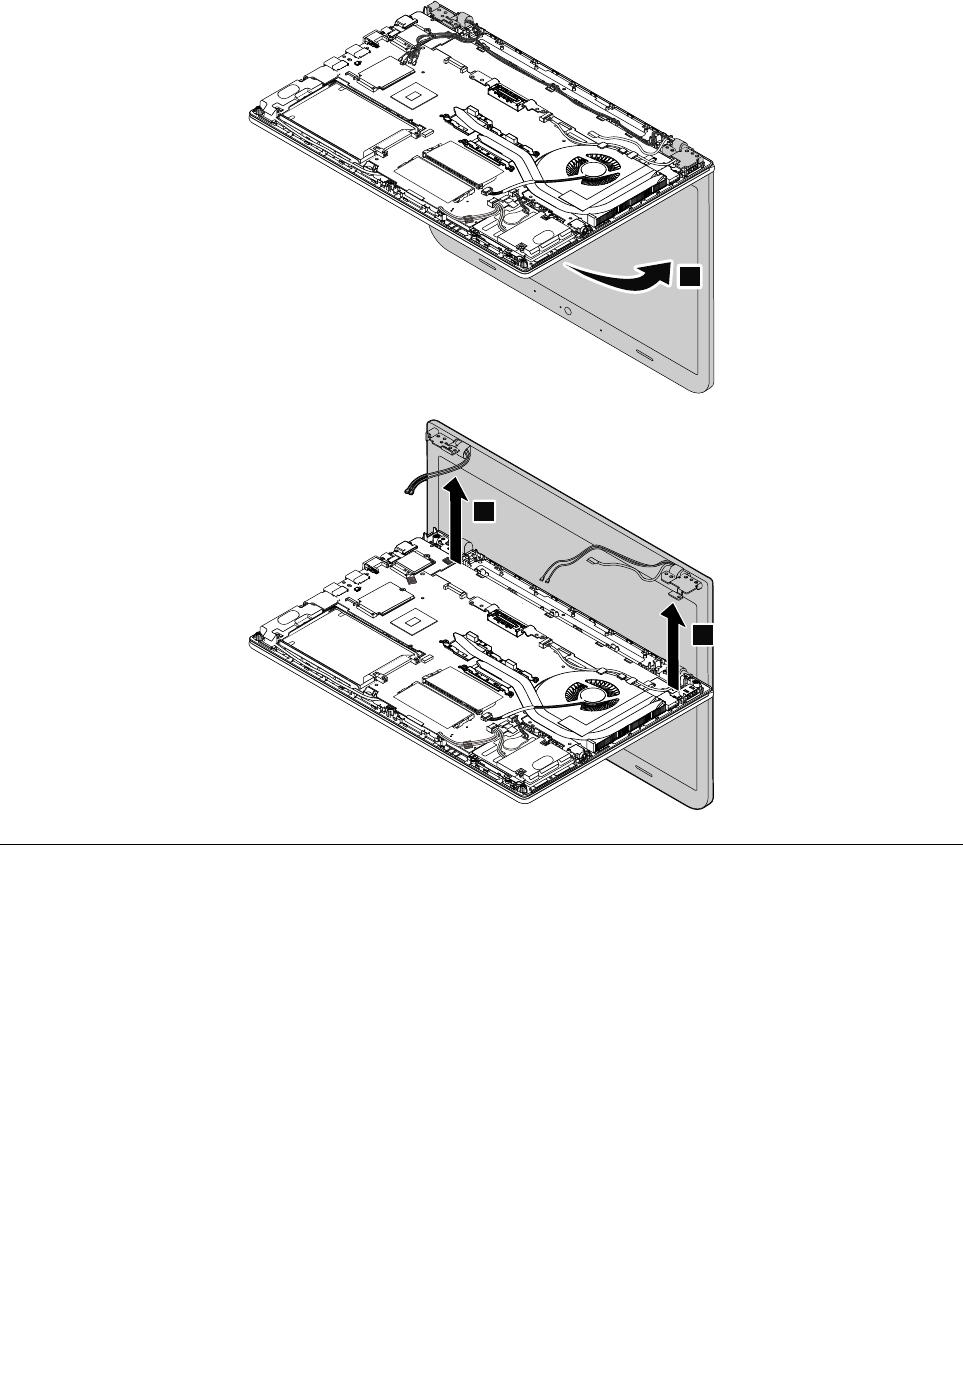 Lenovo T470P Hmm En Sp40M11995 02 User Manual Hardware